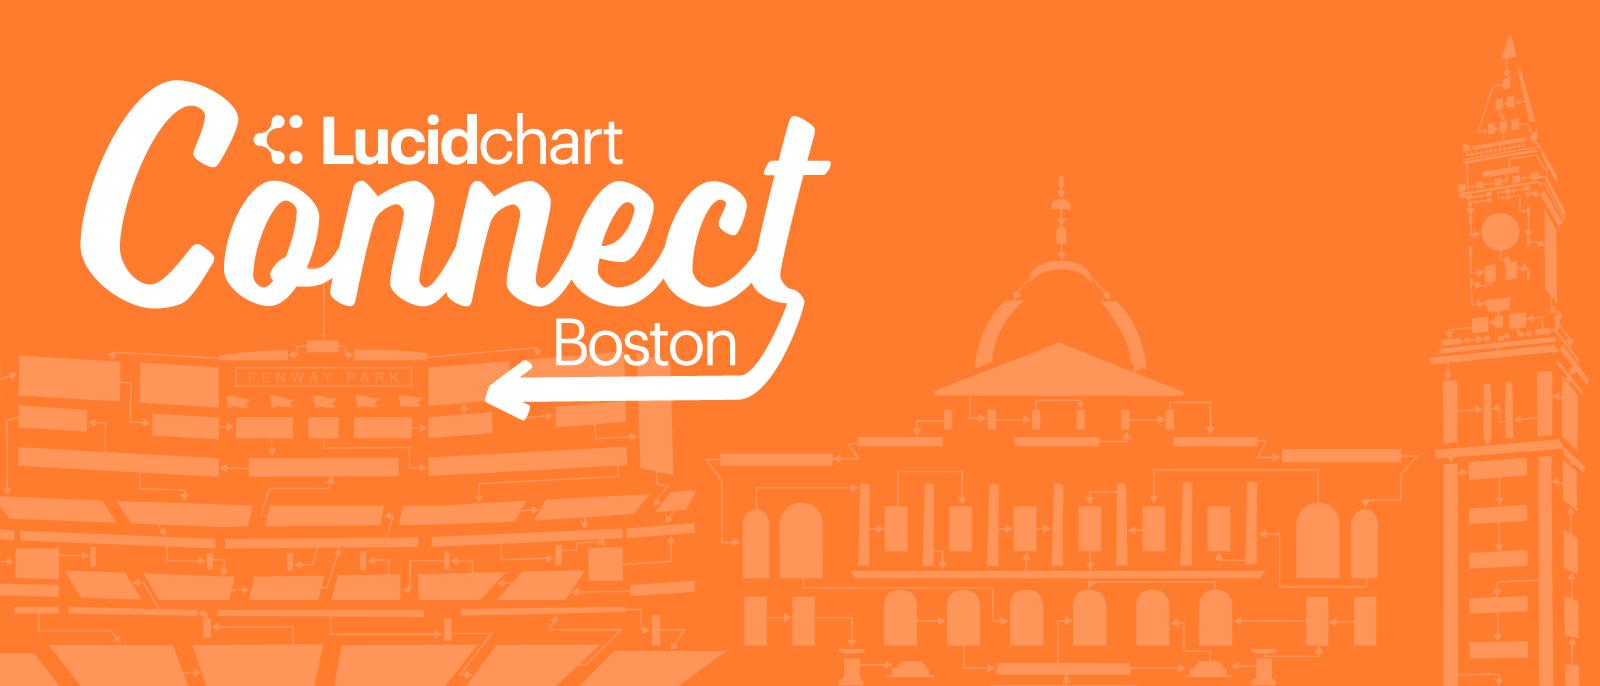 Lucidchart Connect Boston recap